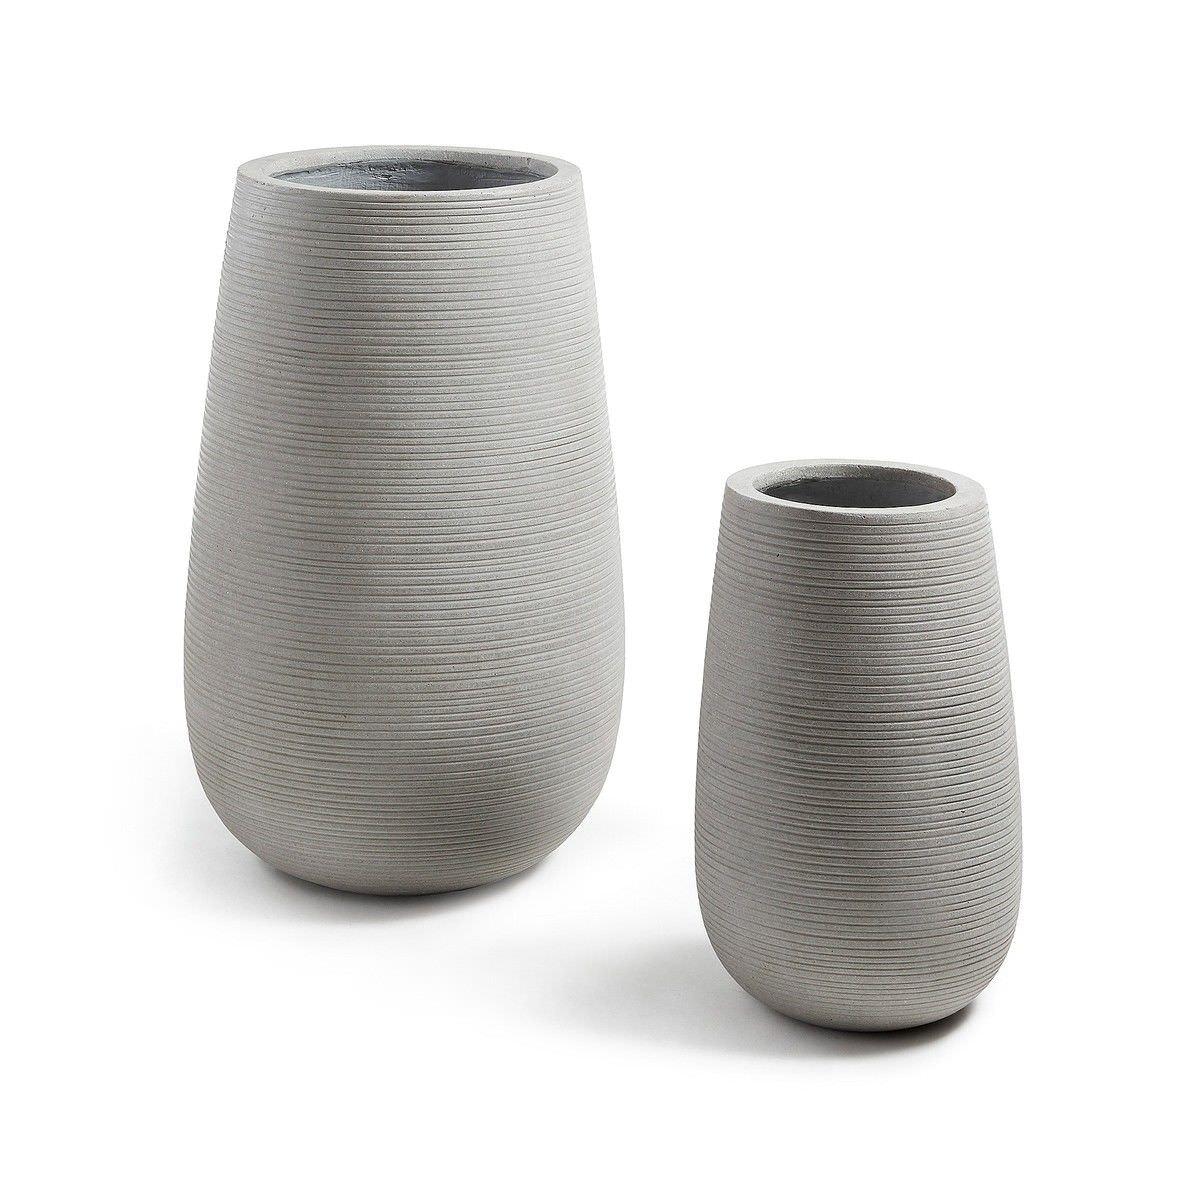 Bozelia 2 Piece Poly Cement Vase Pot Set, Grey